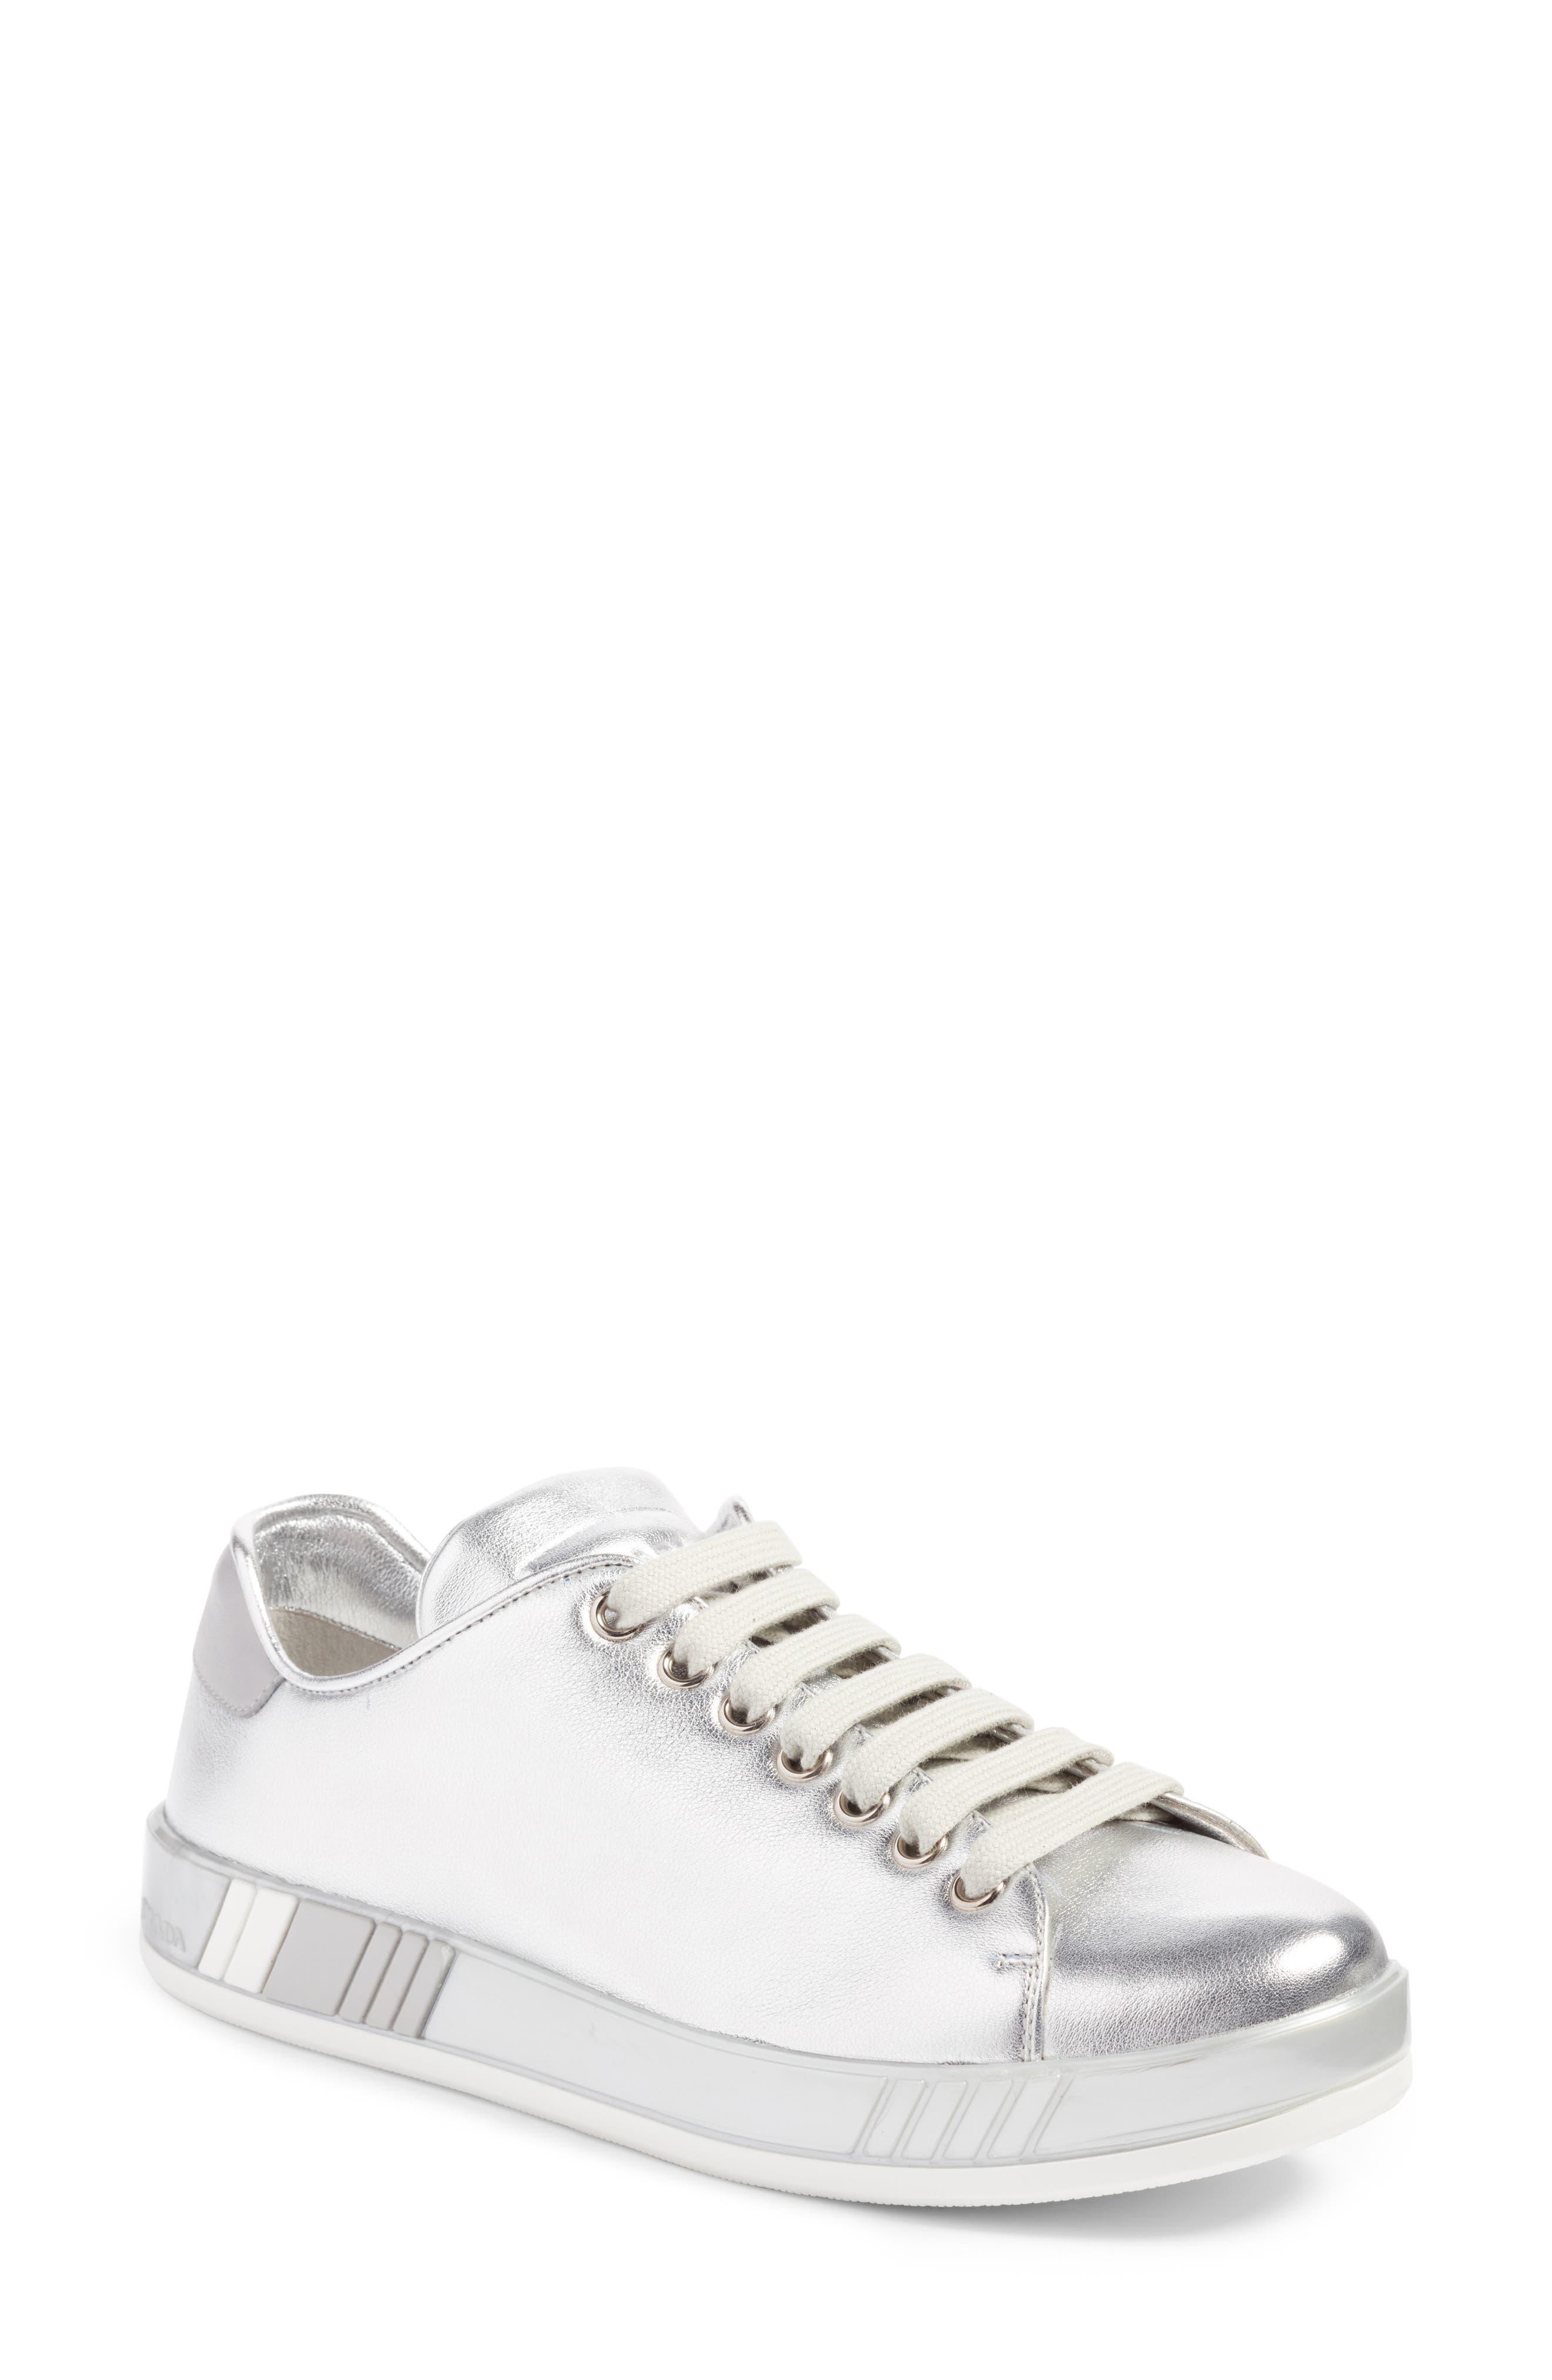 Low Top Sneaker,                         Main,                         color, Metallic Silver